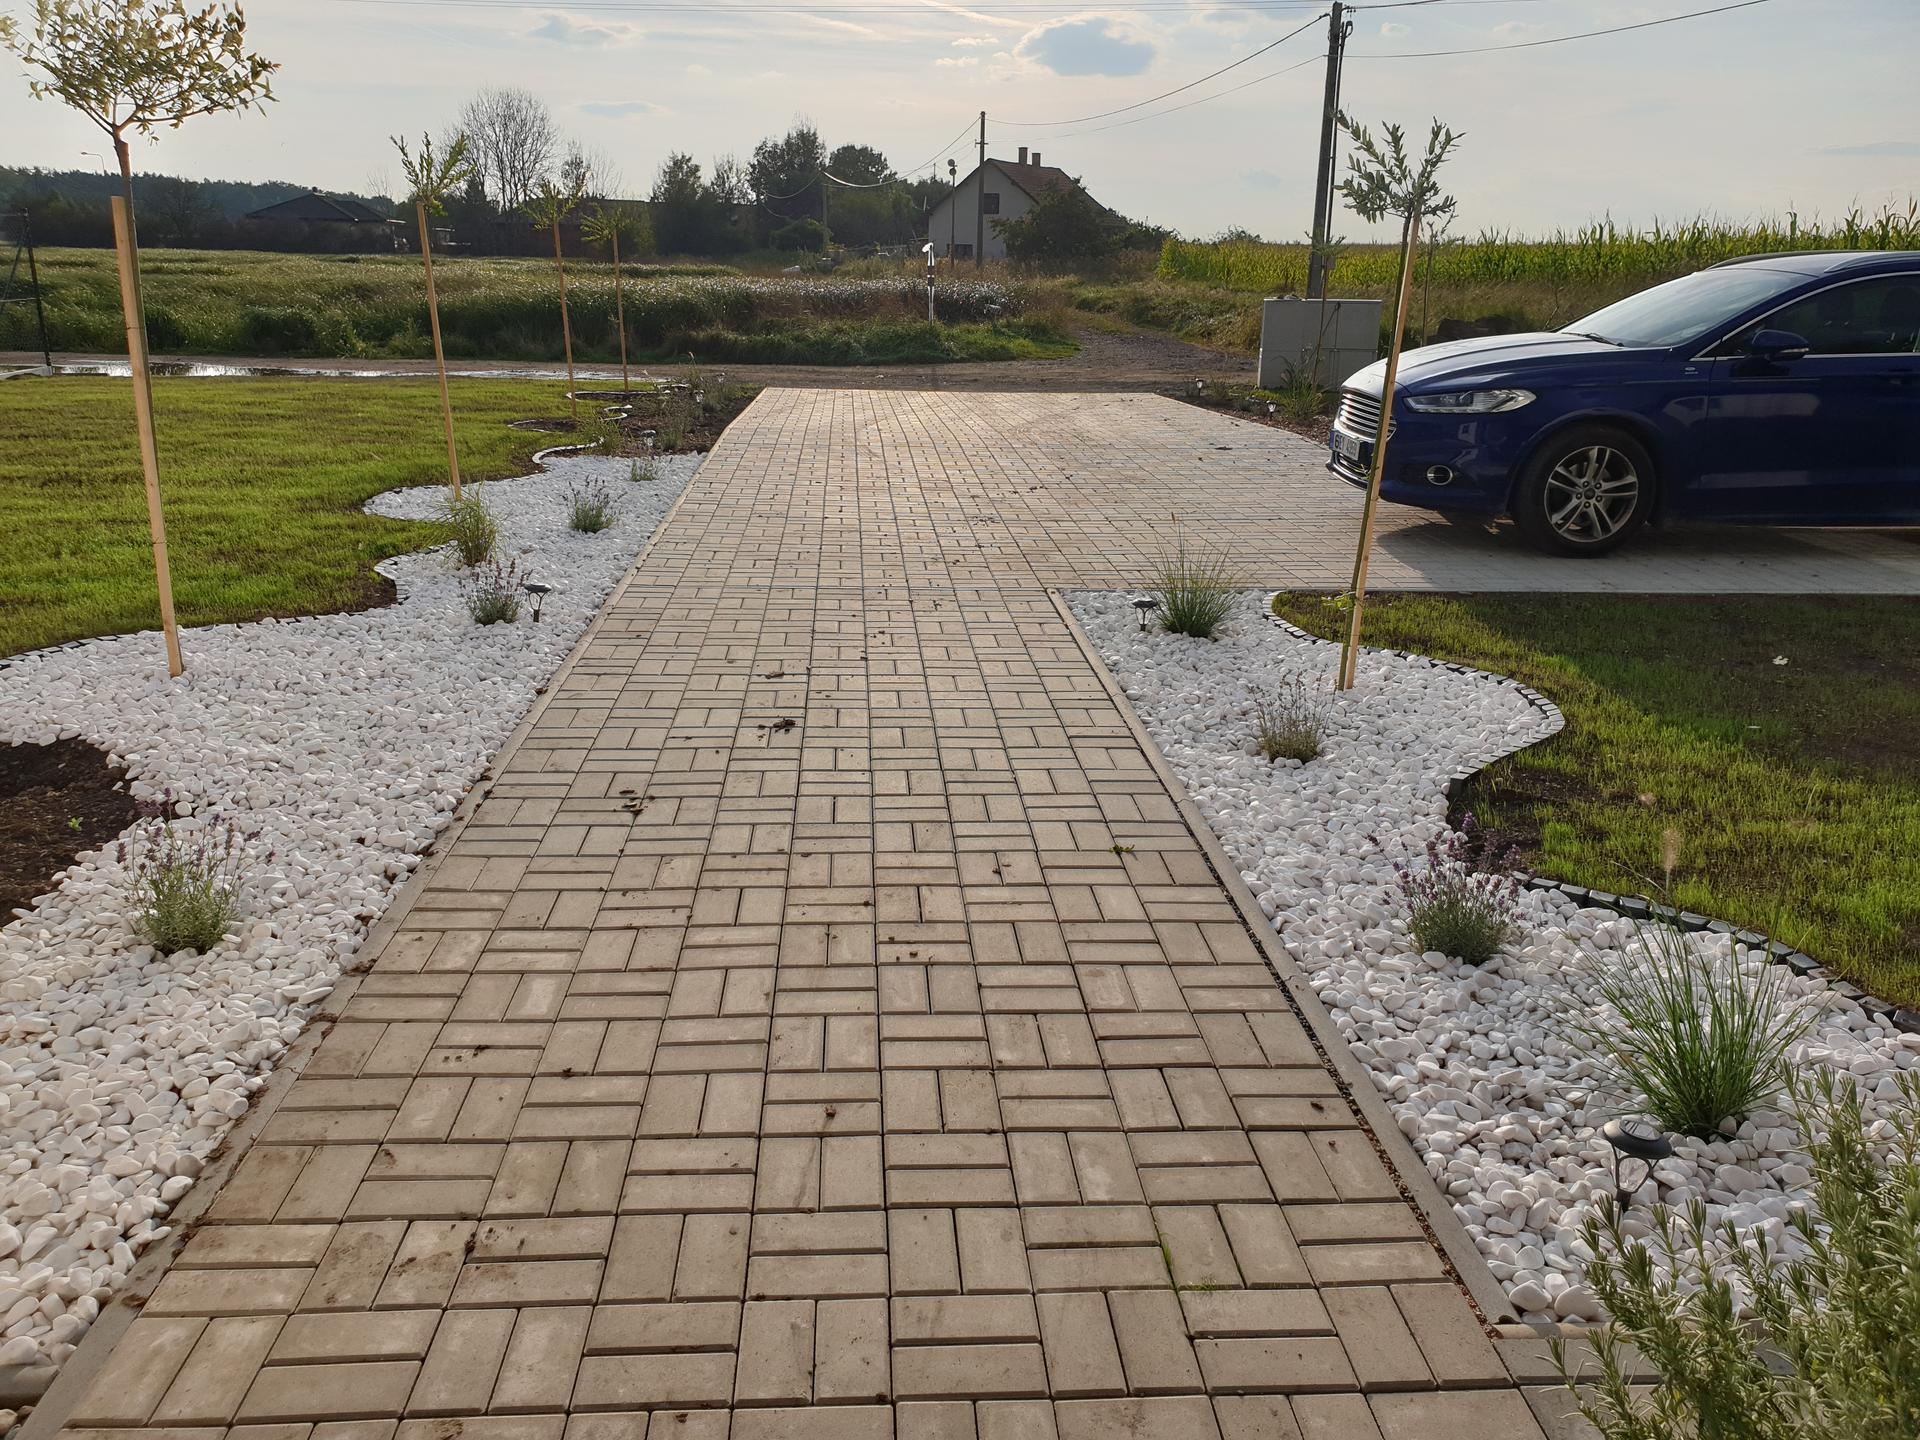 Zahrada a terasa - Obrázek č. 88